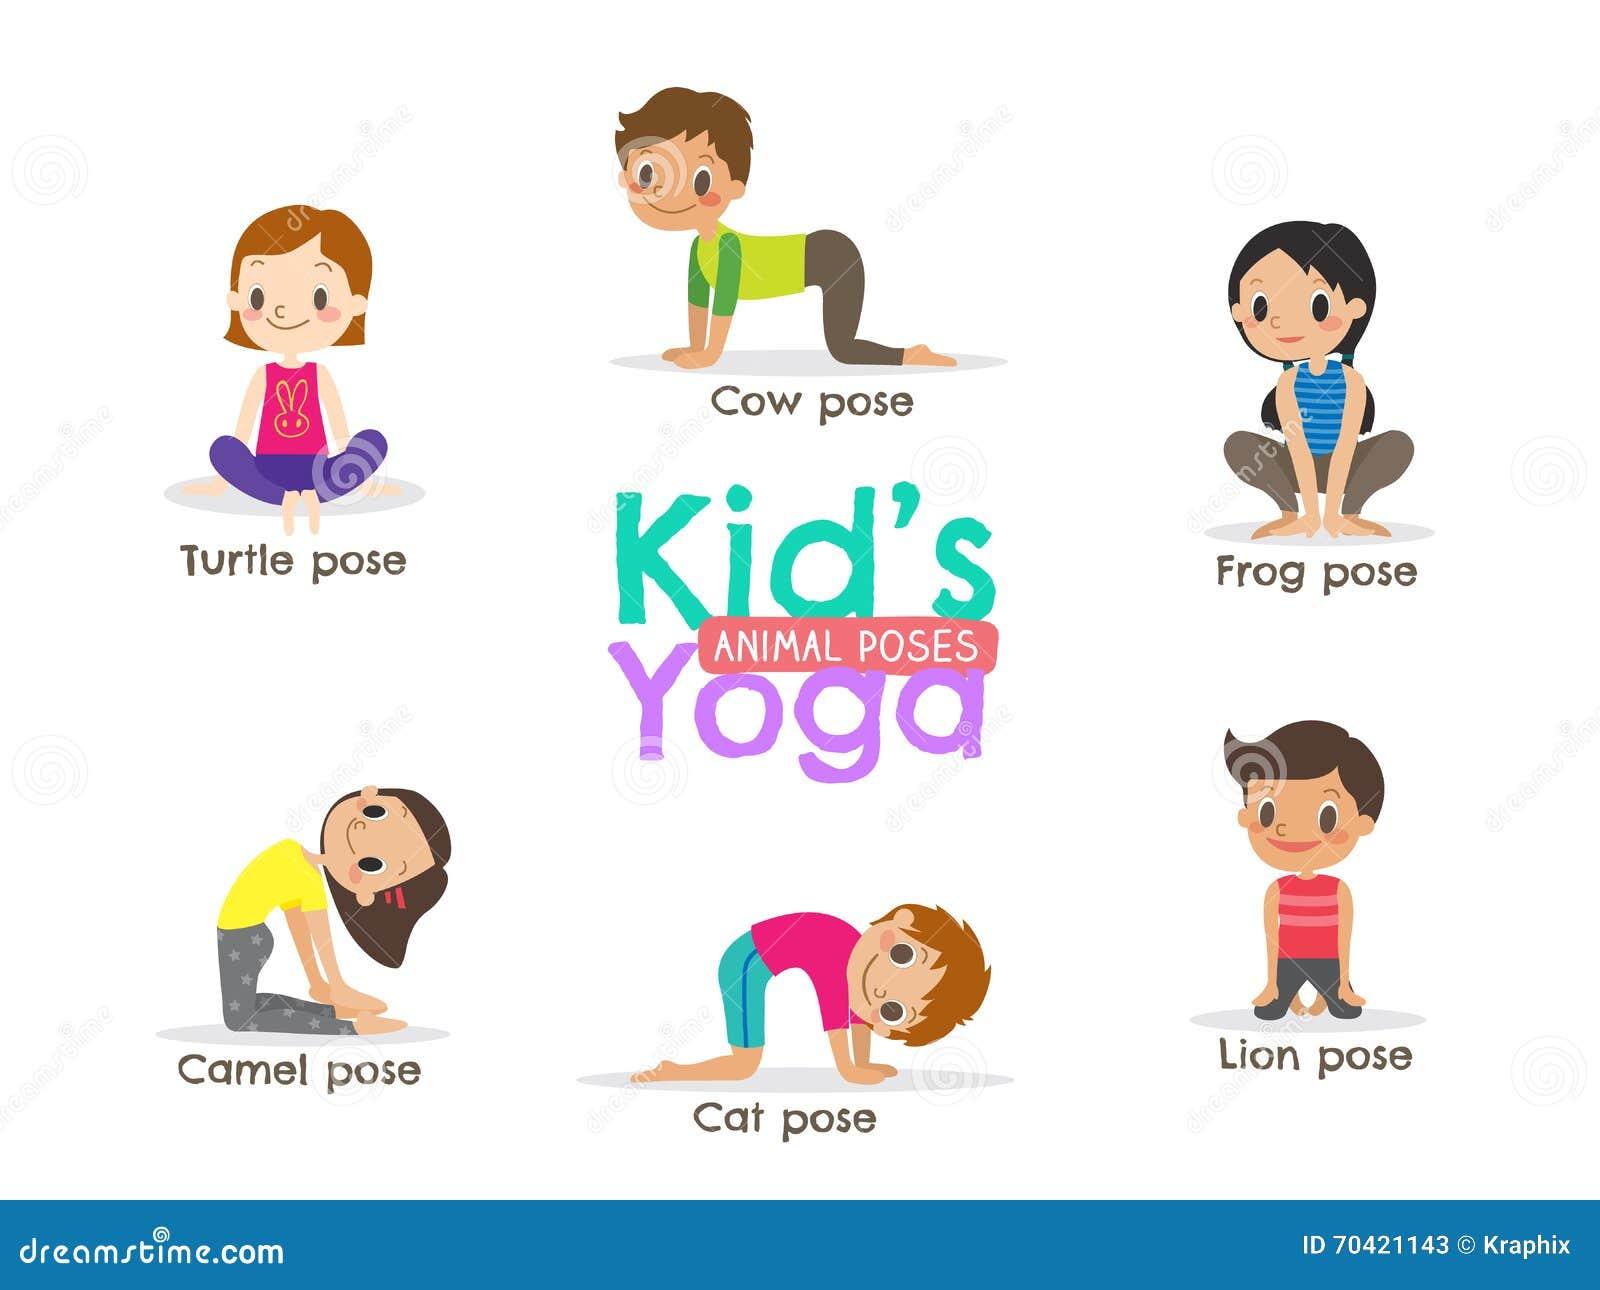 Yoga Kids Poses Vector Illustration Stock Vector - Illustration of